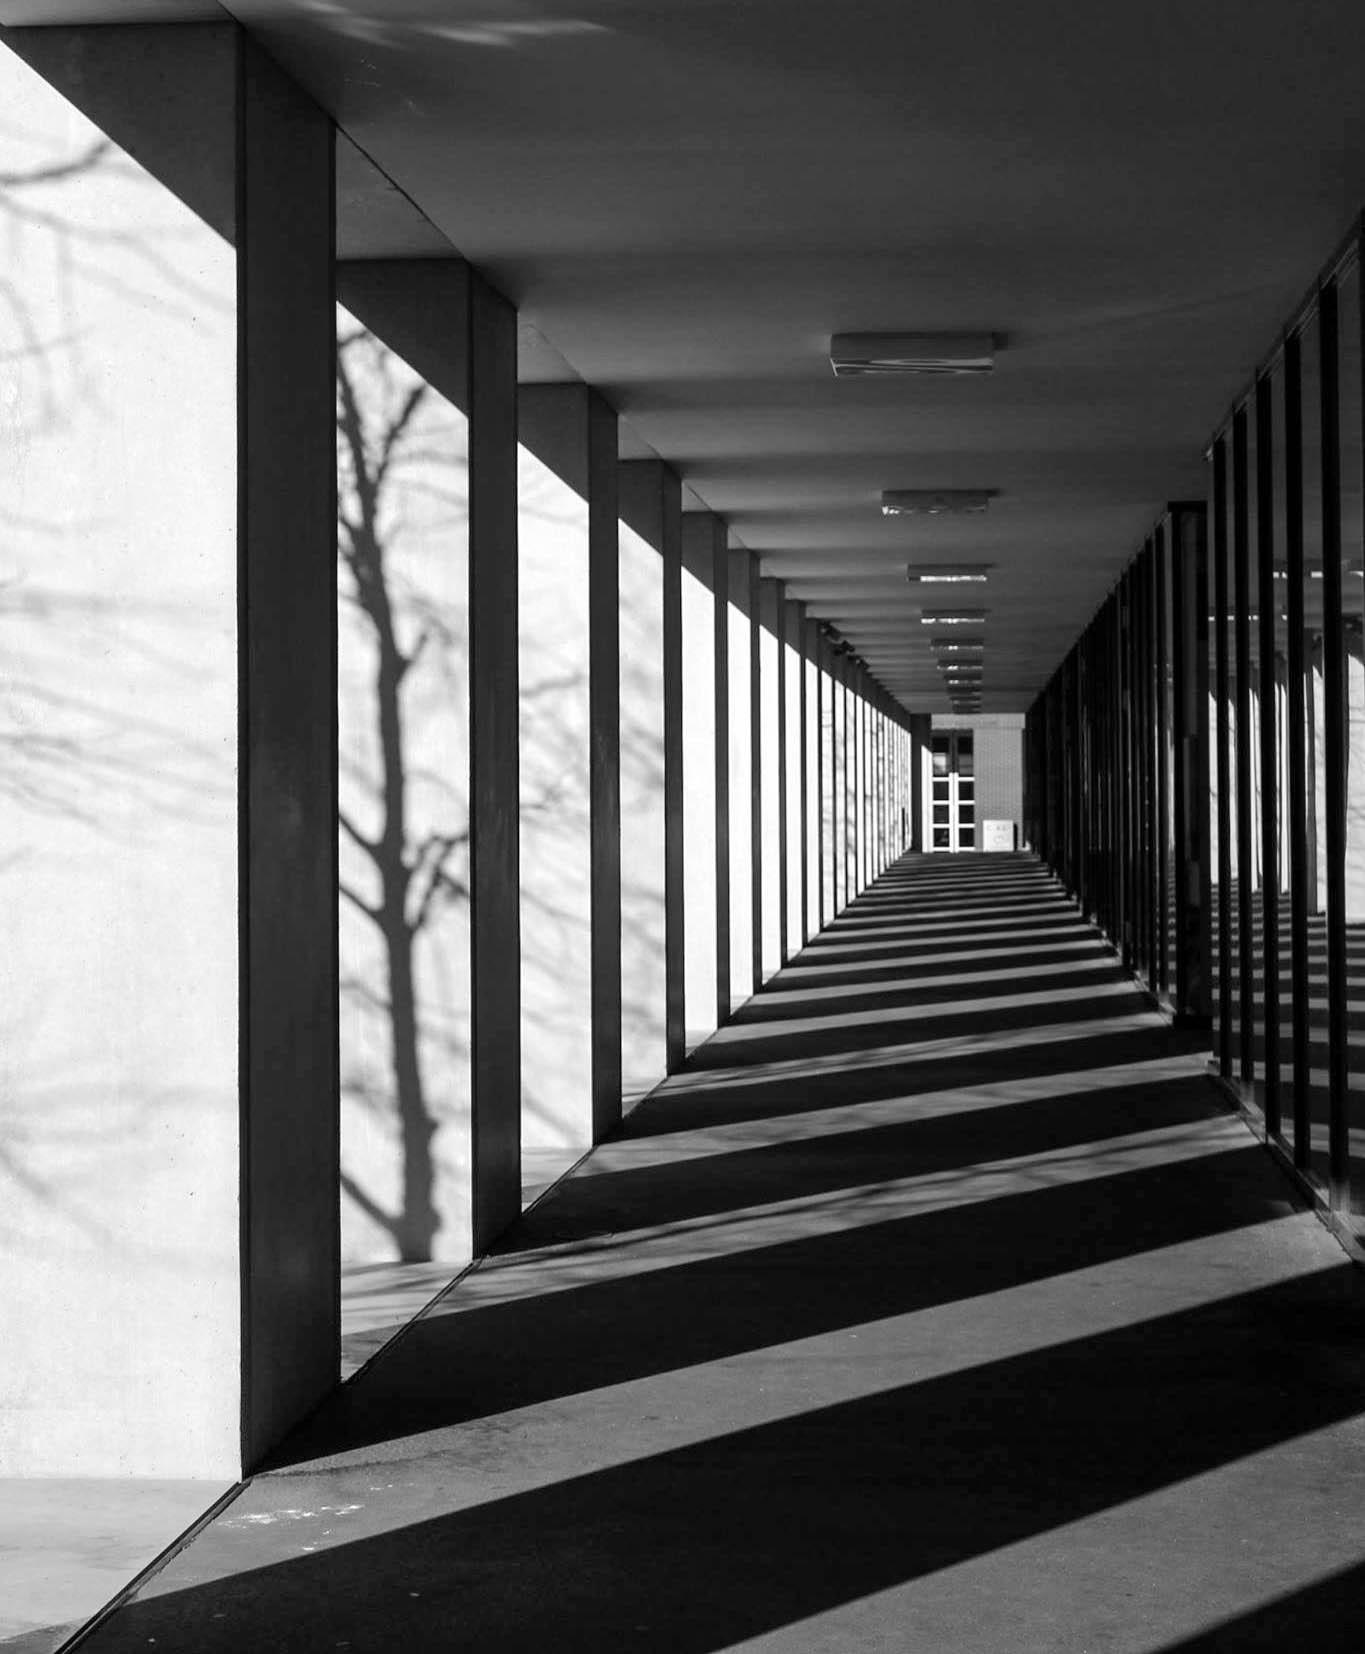 Break in the Shadows by advontage